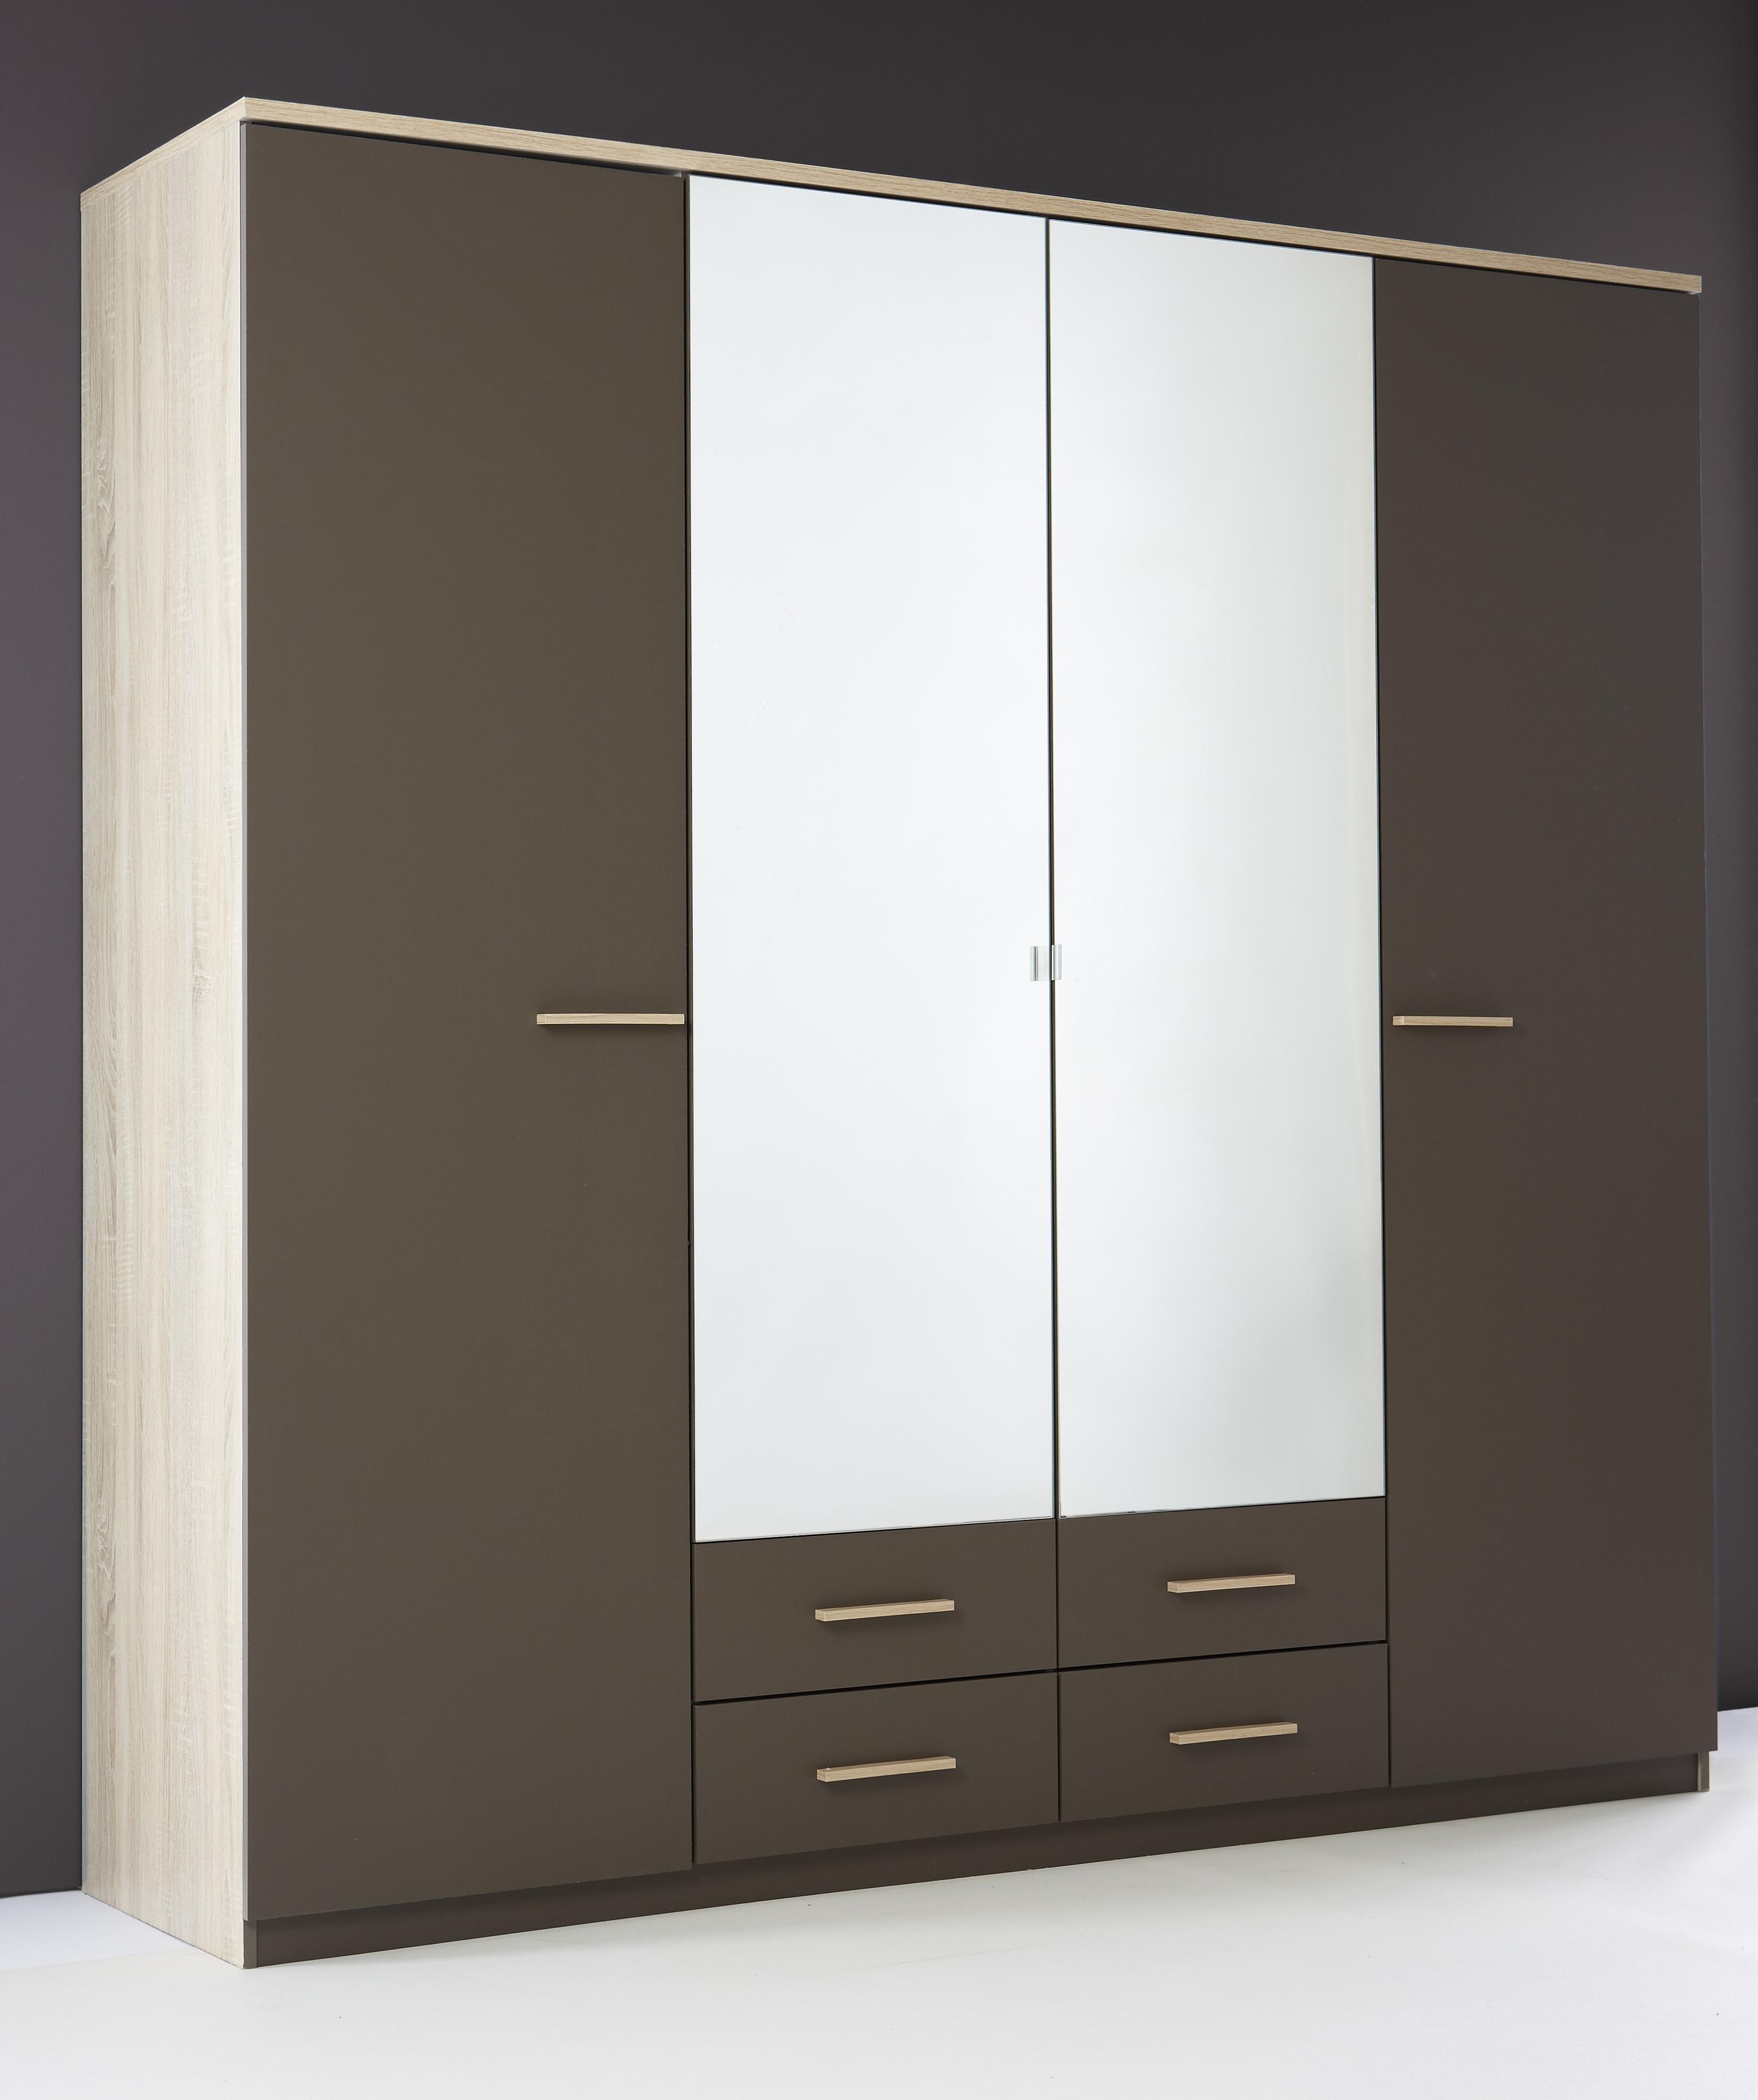 les tendances armoire 4 portes selena. Black Bedroom Furniture Sets. Home Design Ideas